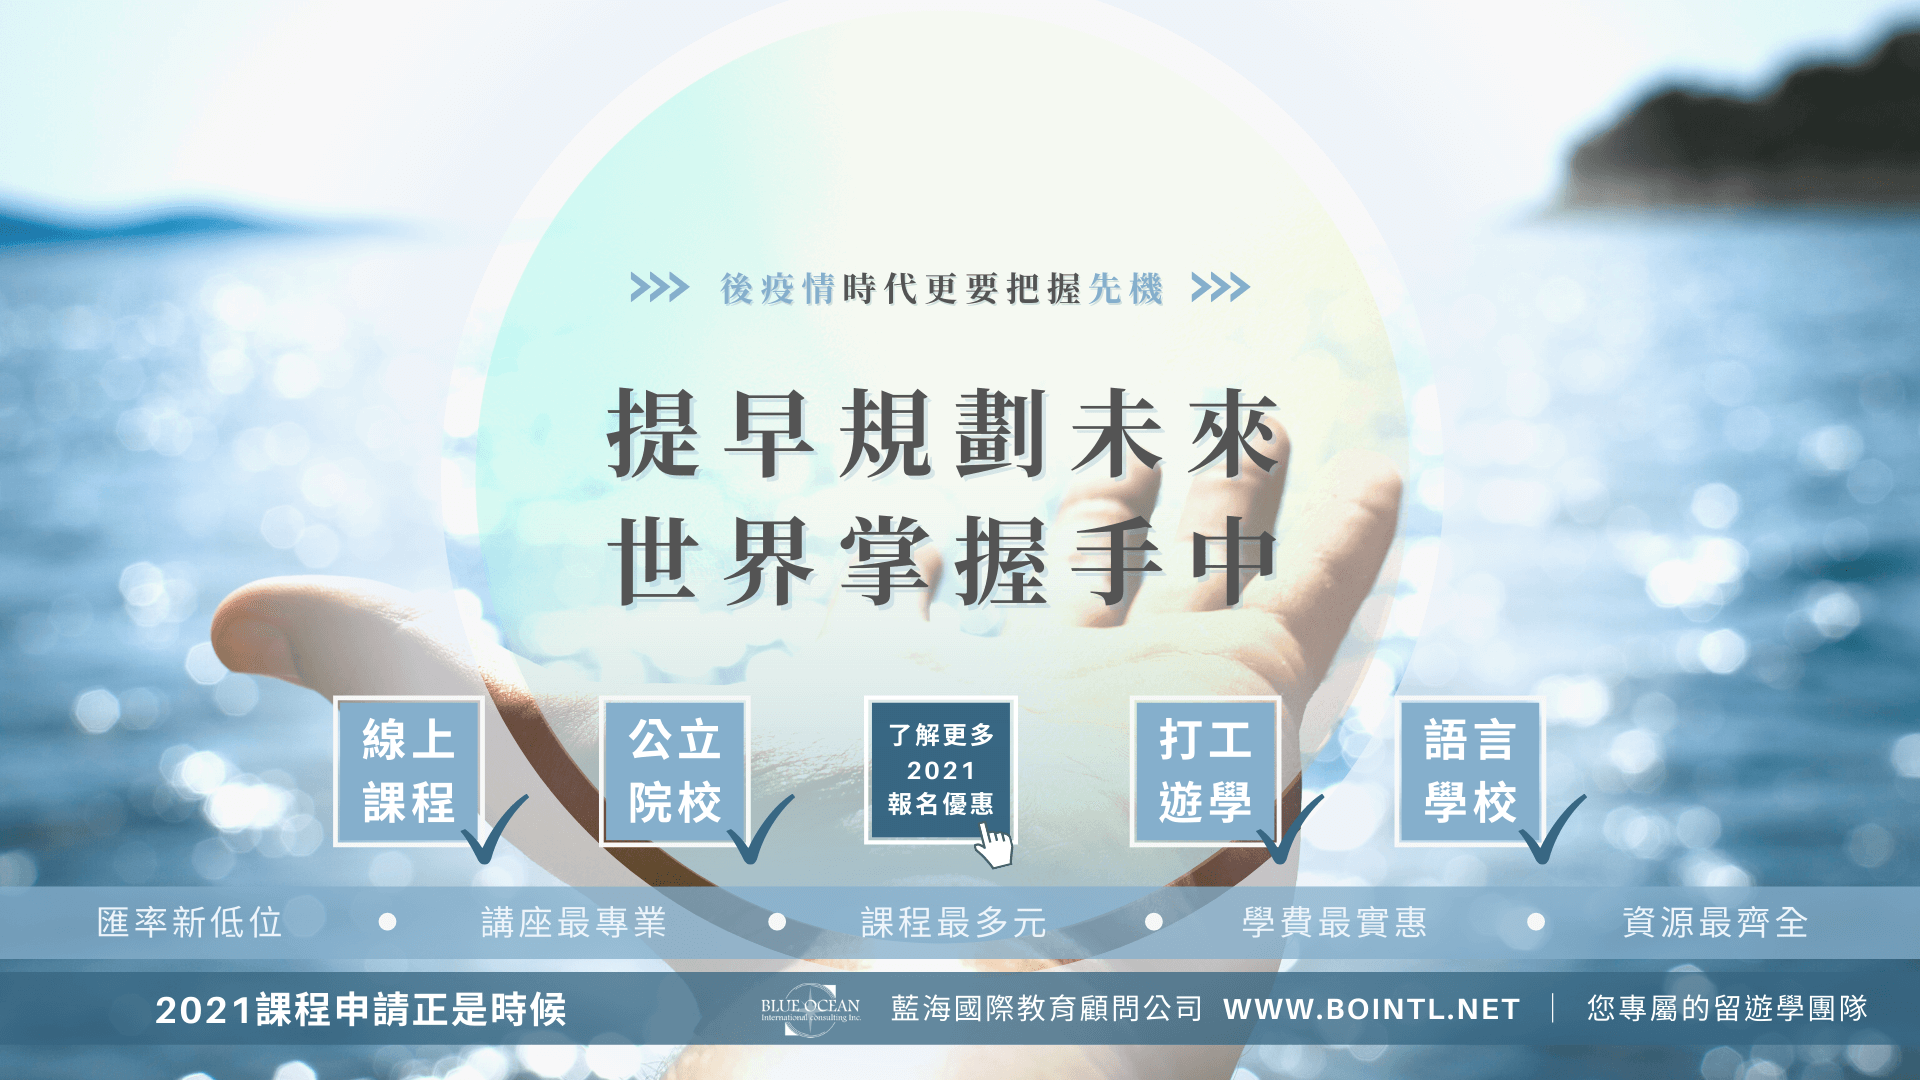 Feb2021_promotion_banner_1080x878